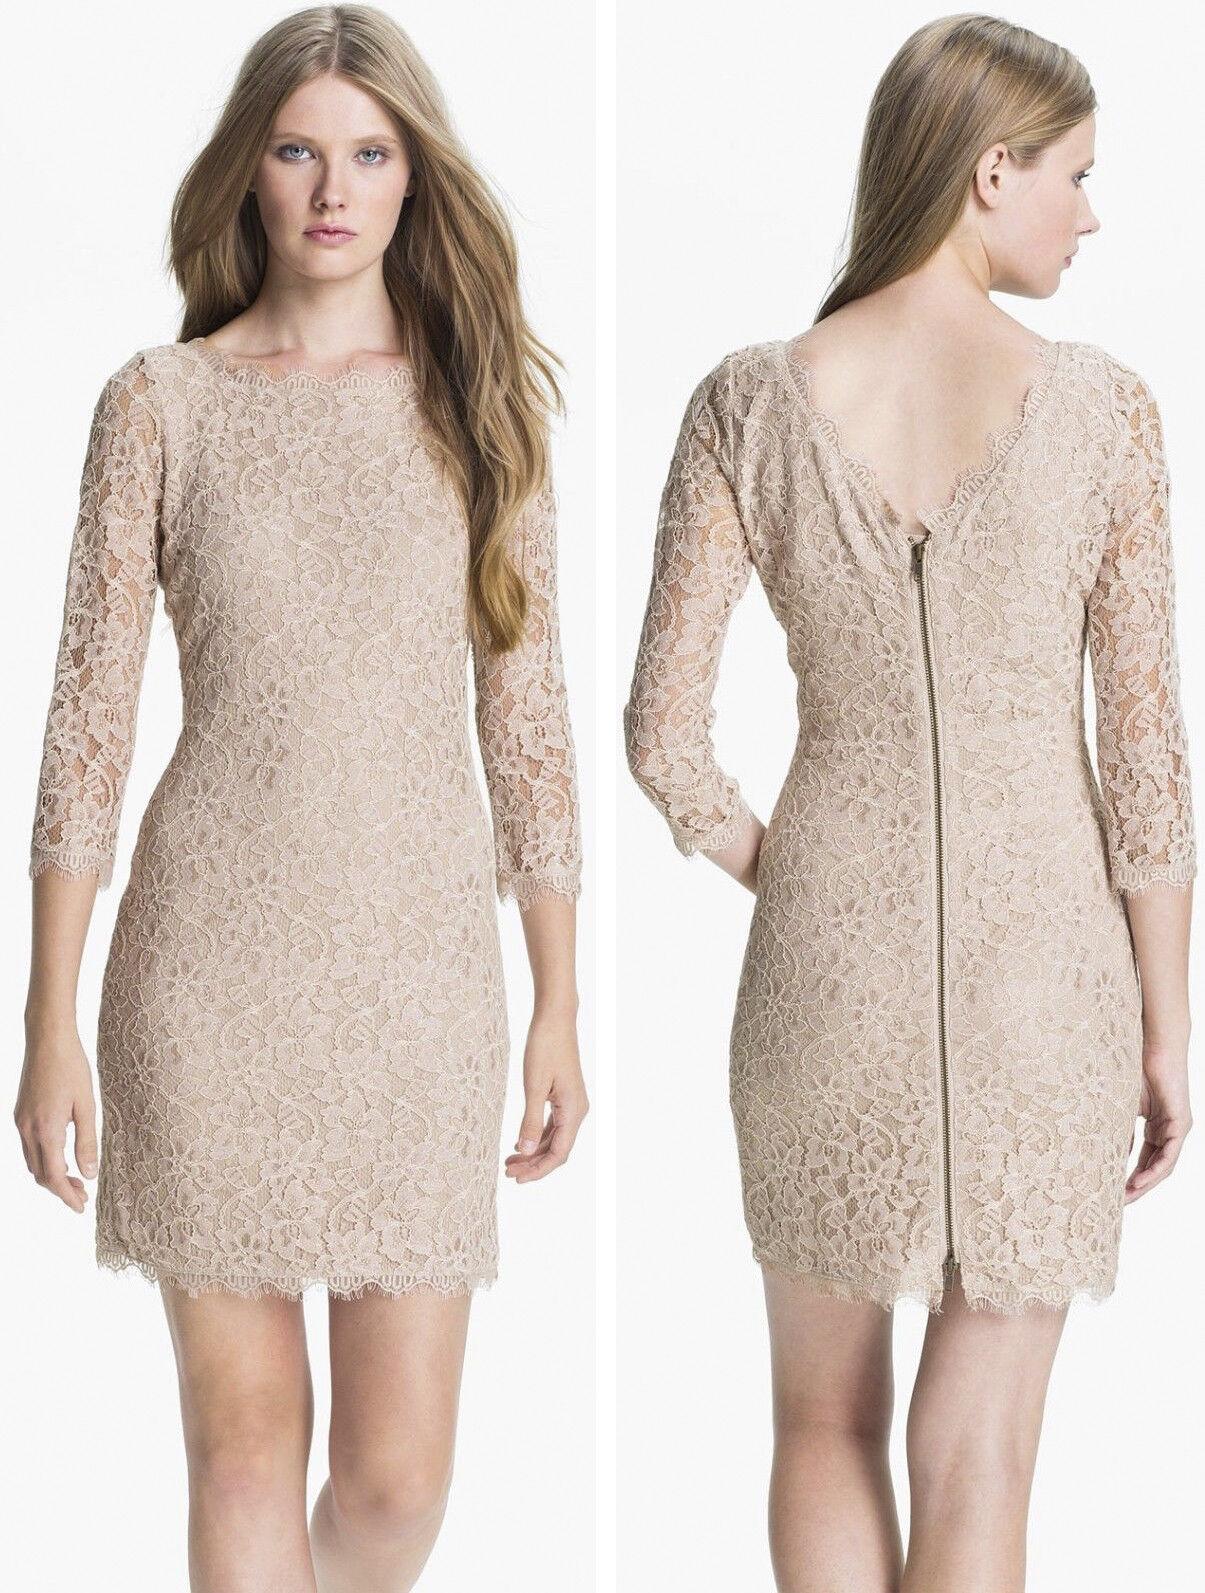 325 Diane Von Furstenberg DVF Zarita Nude Beige Stretch Lace Shift Dress 14